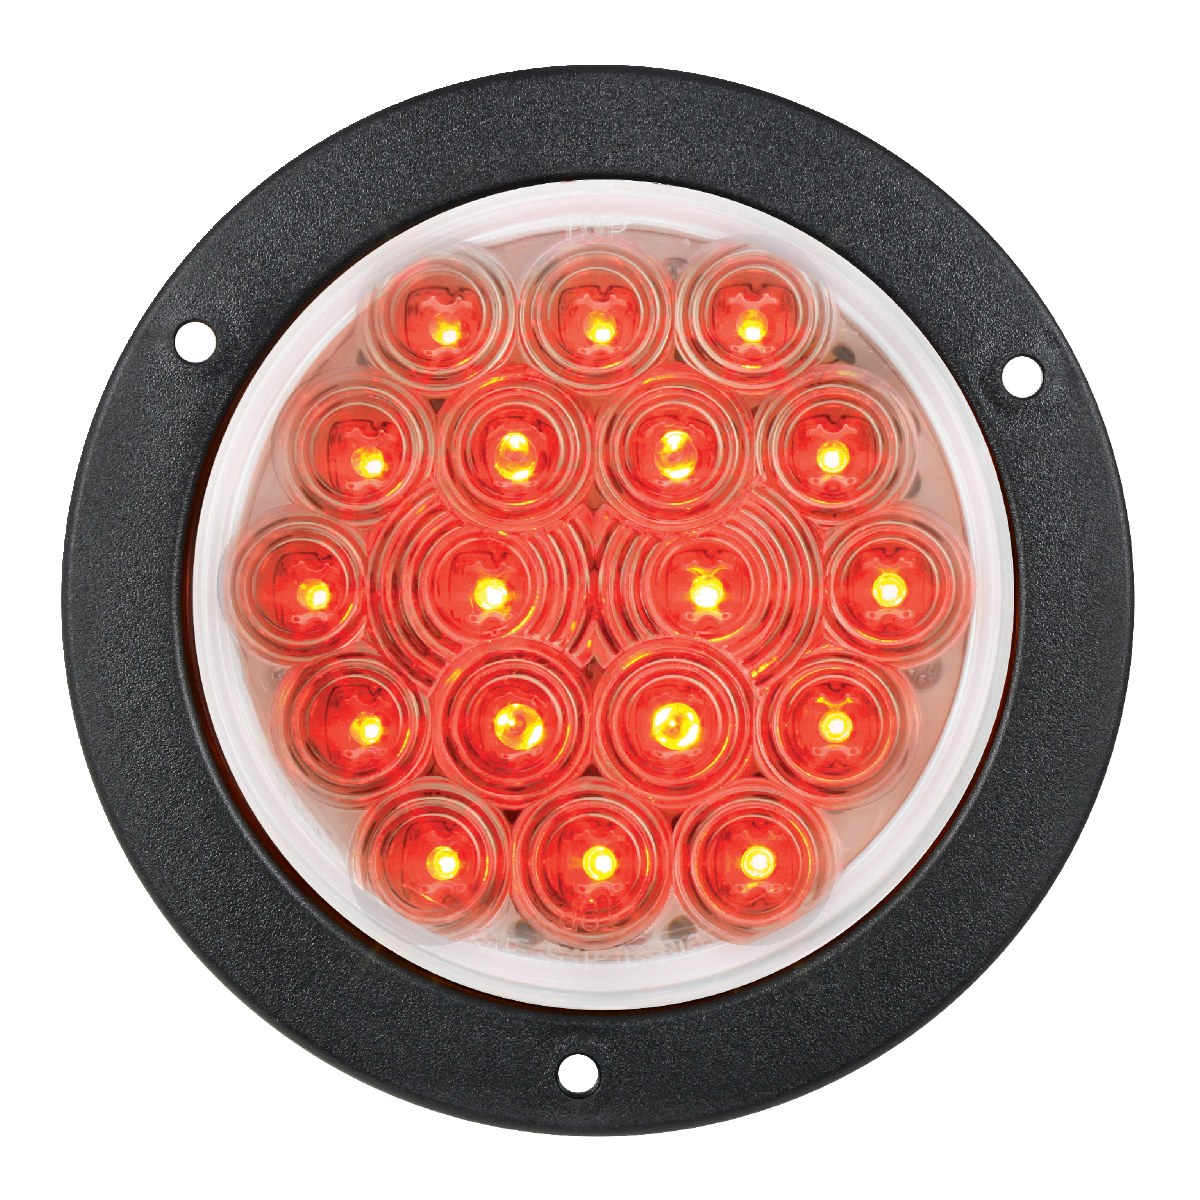 "75913 Red/Clear 4"" Fleet LED Light with Black Flange Mount"